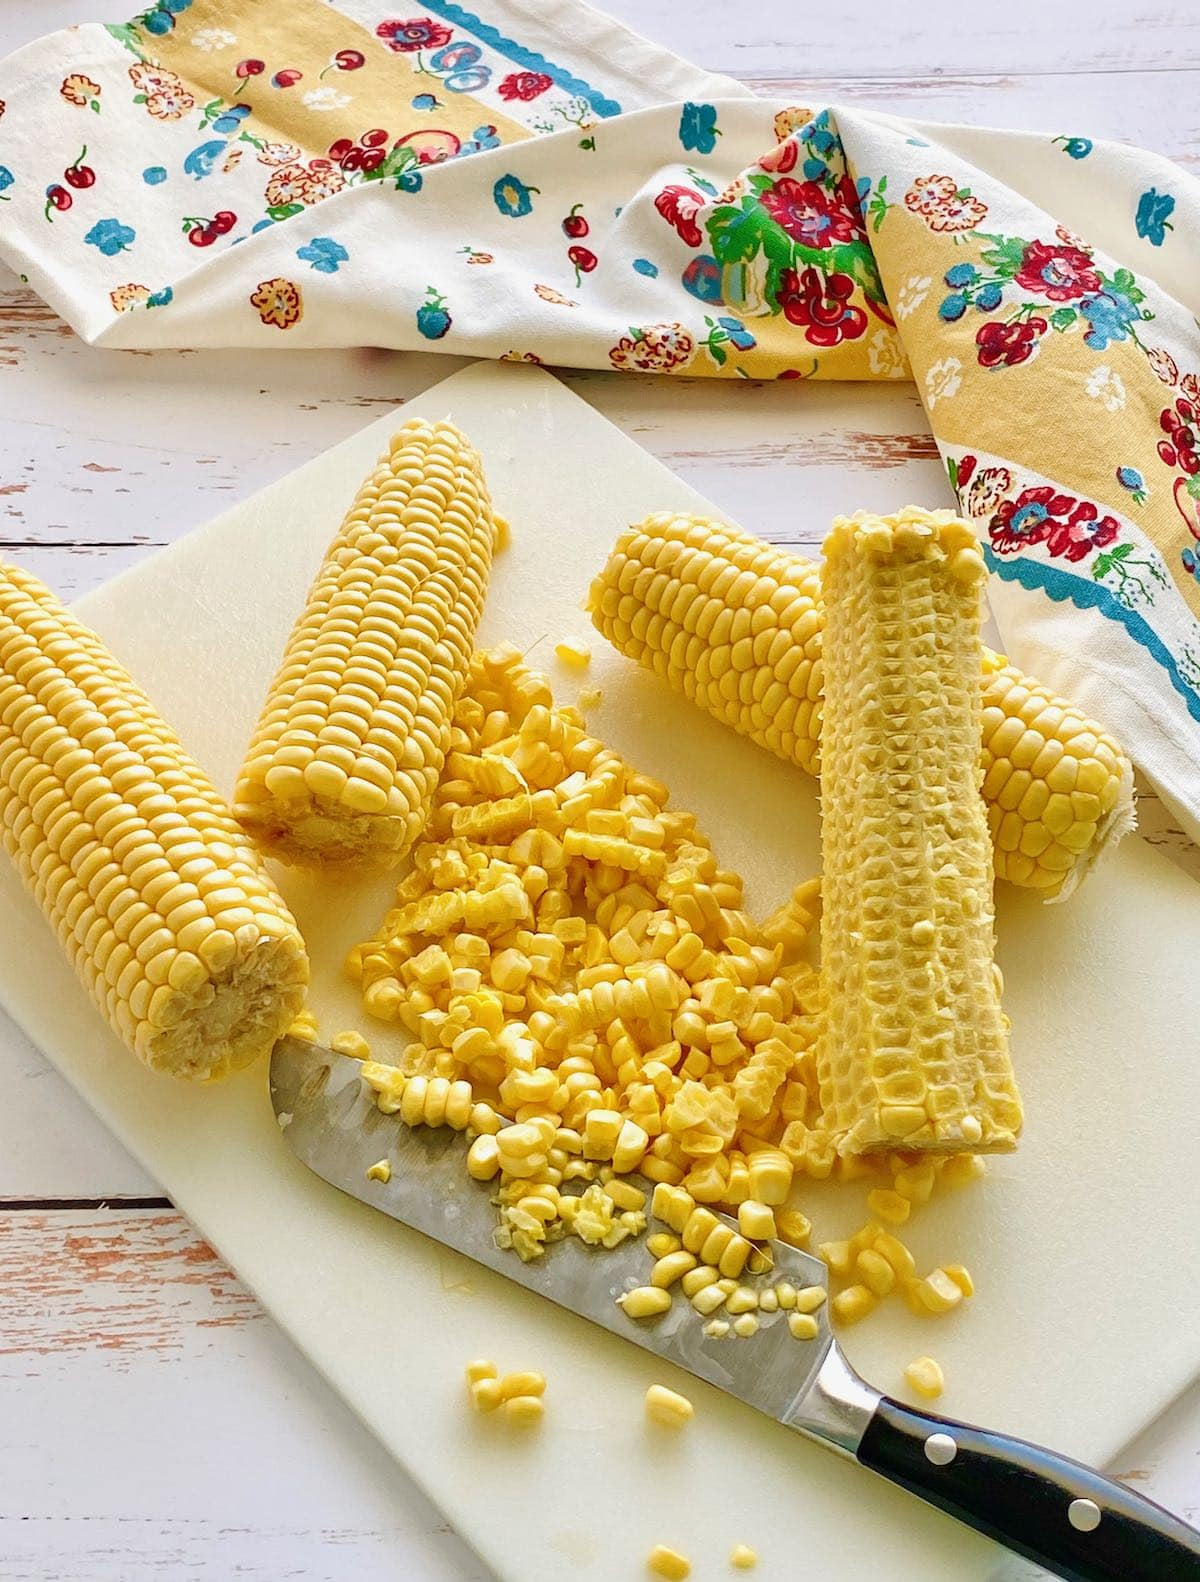 cutting corn off the cob onto a cutting board.